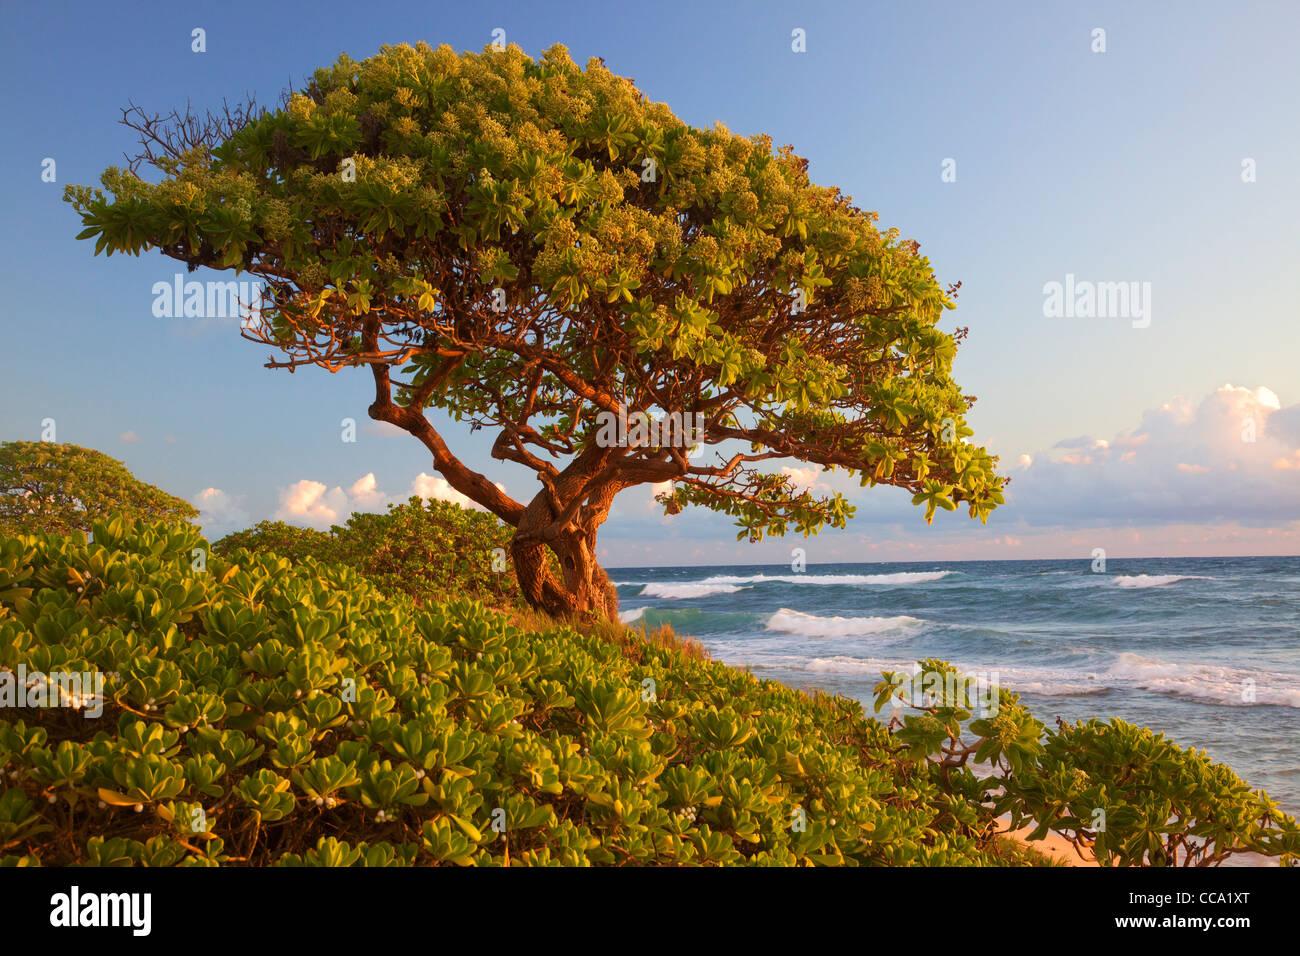 Nukoli'i Beach, also known as Kitchens Beach, Kauai, Hawaii. - Stock Image